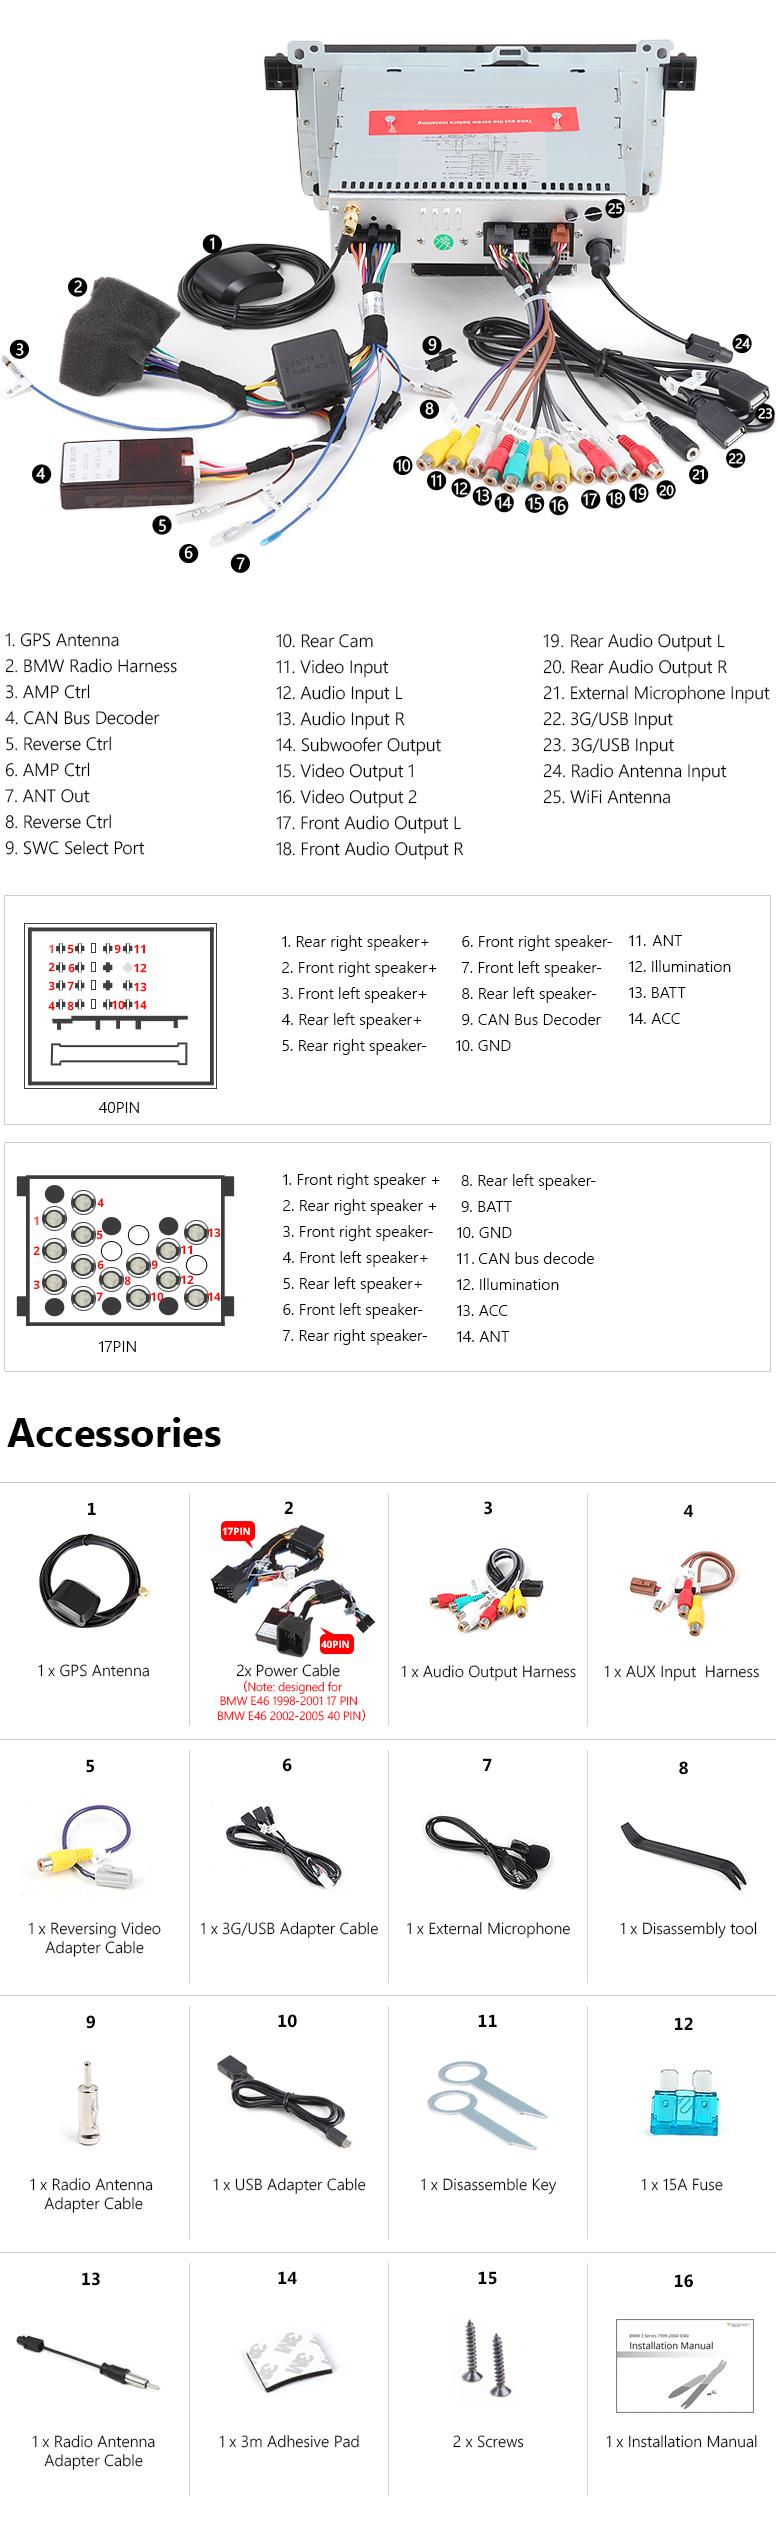 Tremendous Eonon Ga7150A Bmw E46 Android 6 0 Octa Core Car Stereo Gps Eonon Wiring Digital Resources Honesemecshebarightsorg